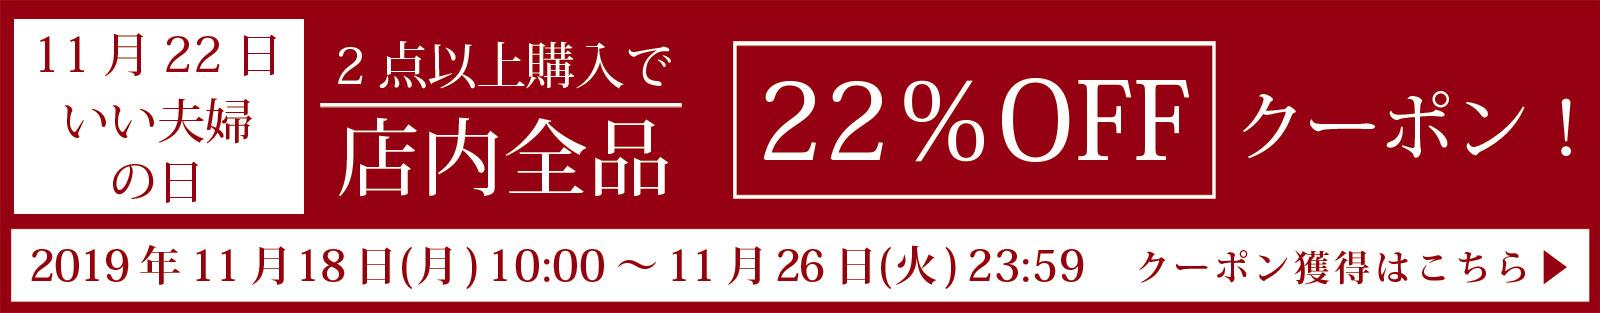 22_couponいい夫婦の日